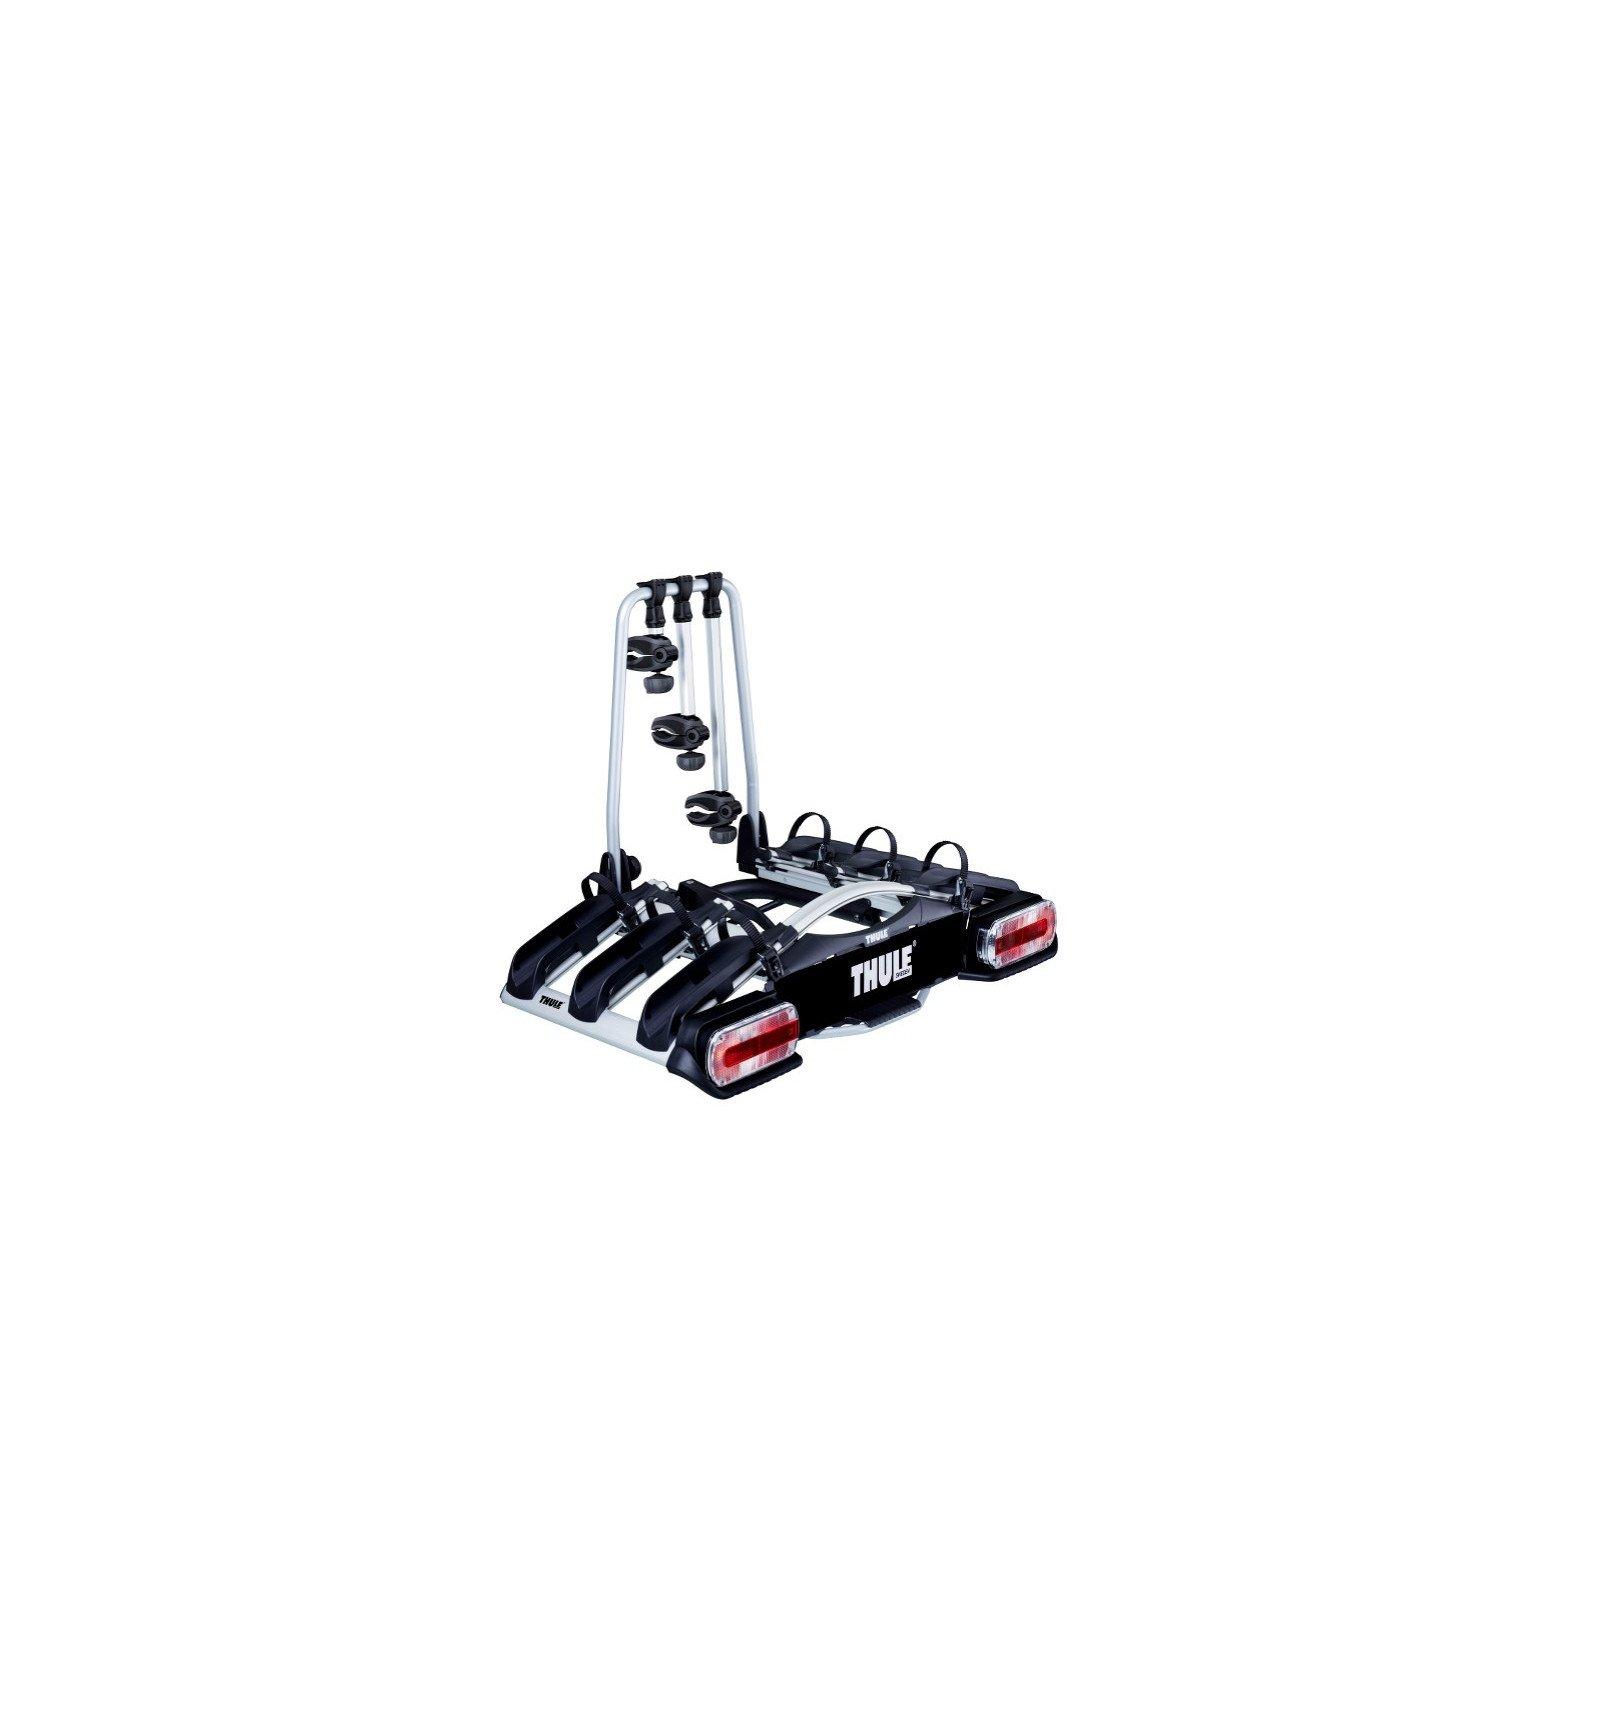 porte velo attache remorque euroway g2 3bike 7pin 2014. Black Bedroom Furniture Sets. Home Design Ideas